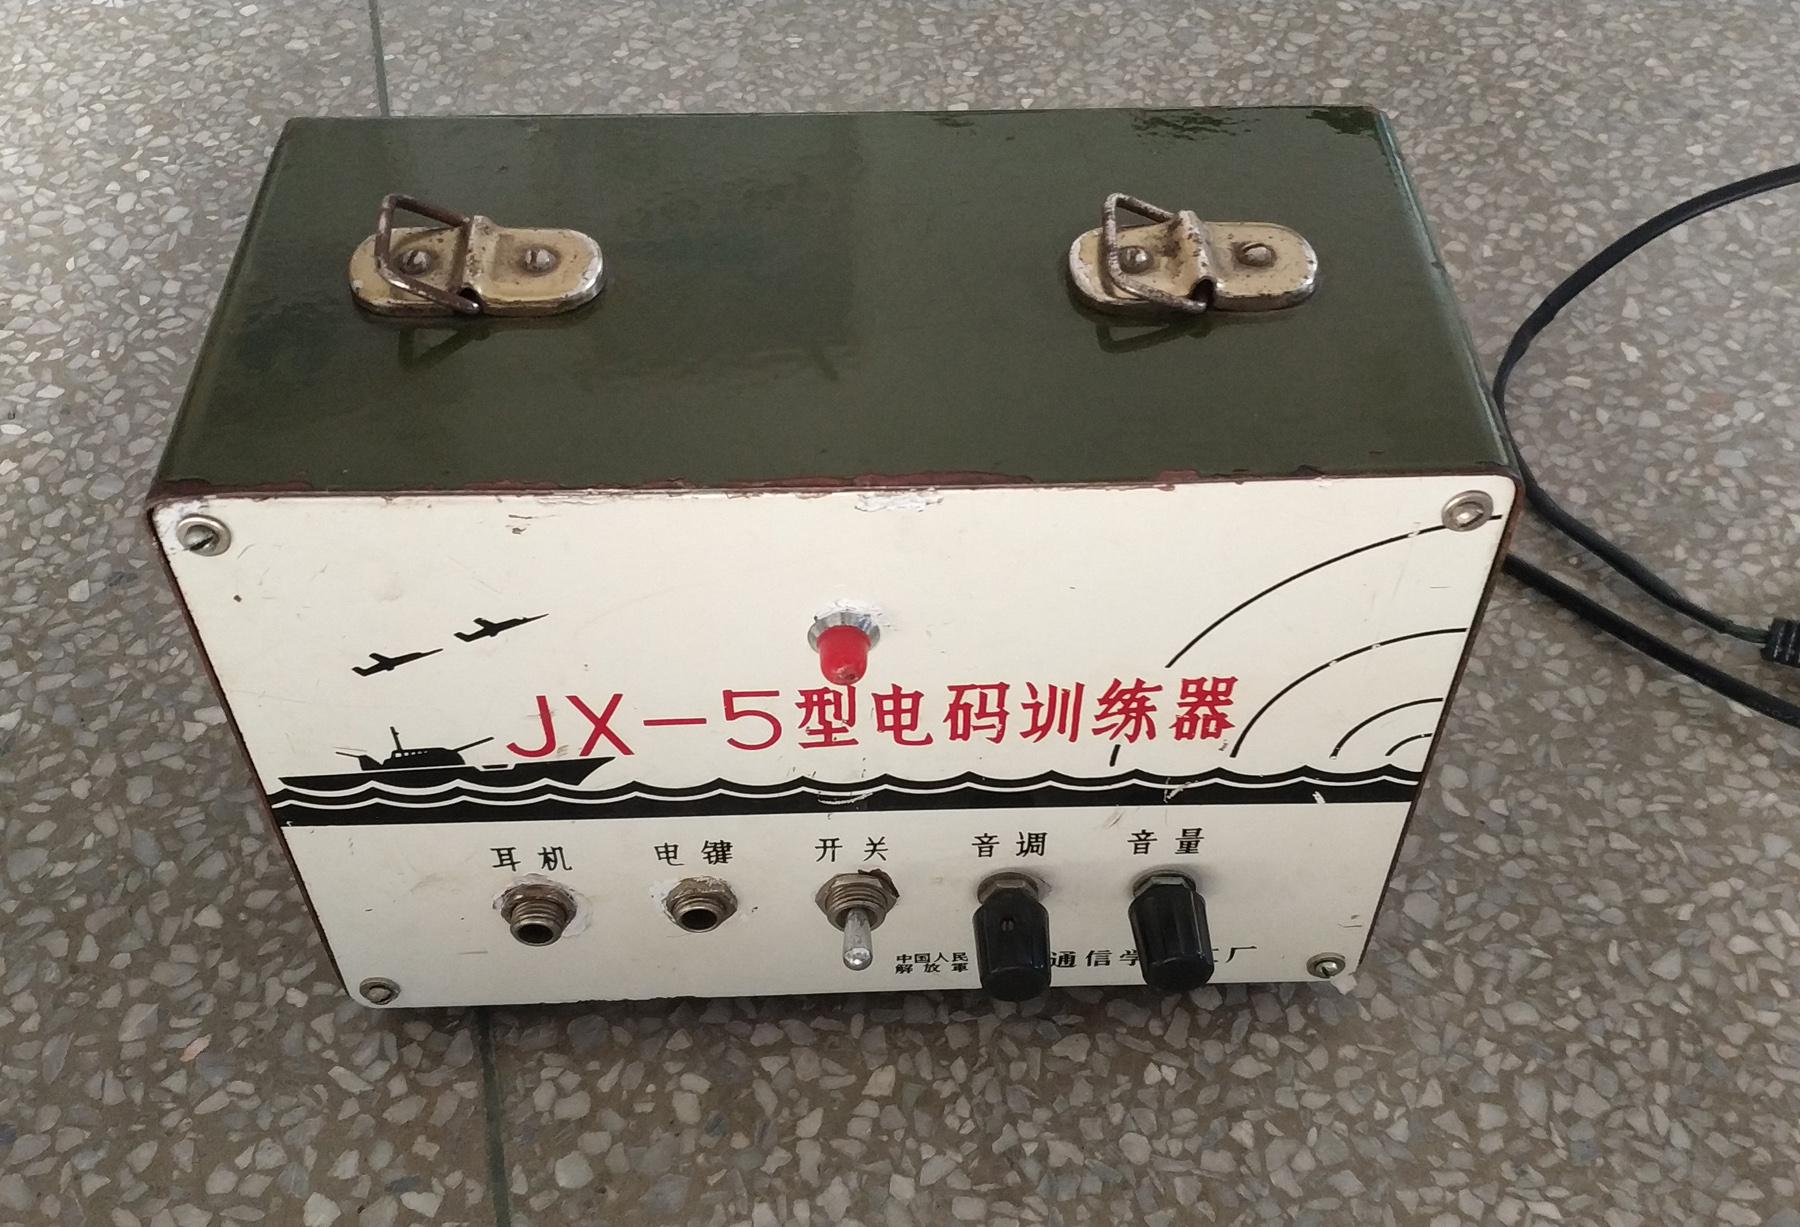 Chun Detang transmitter telegraph mos code JX-5 code trainer